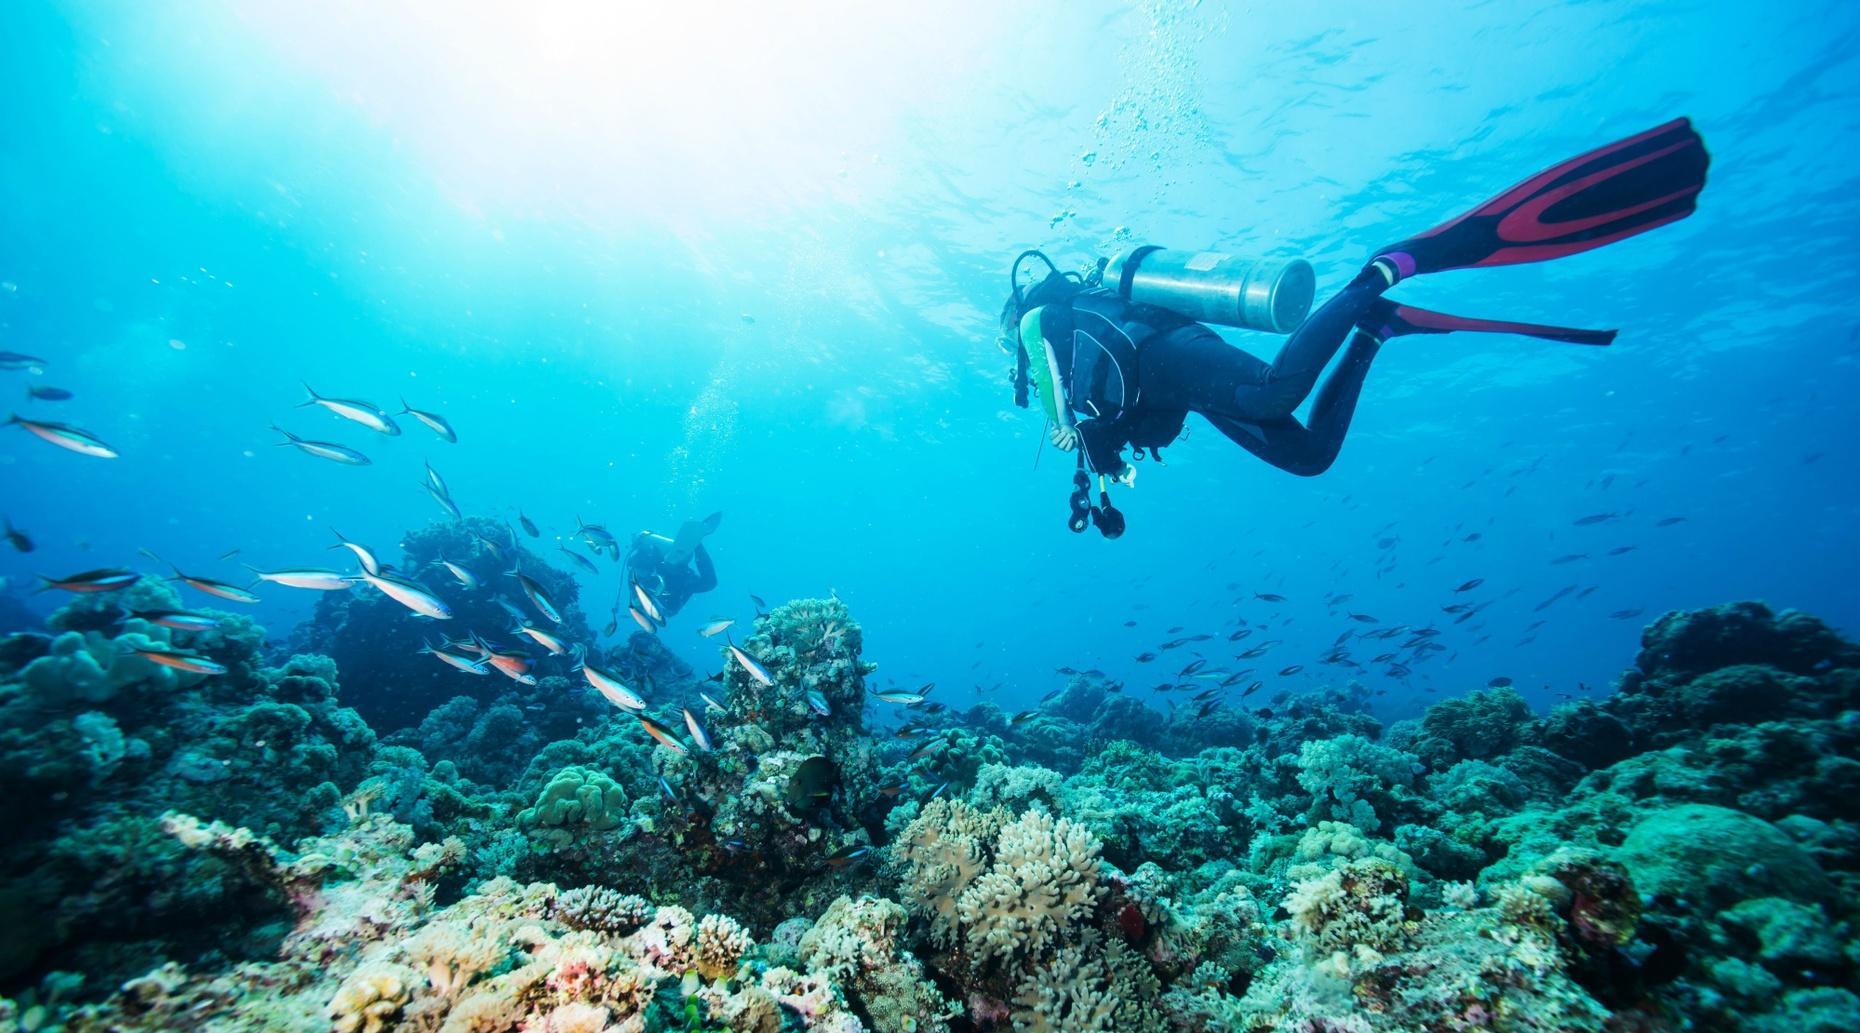 Private Dive Charter in the Dominican Republic